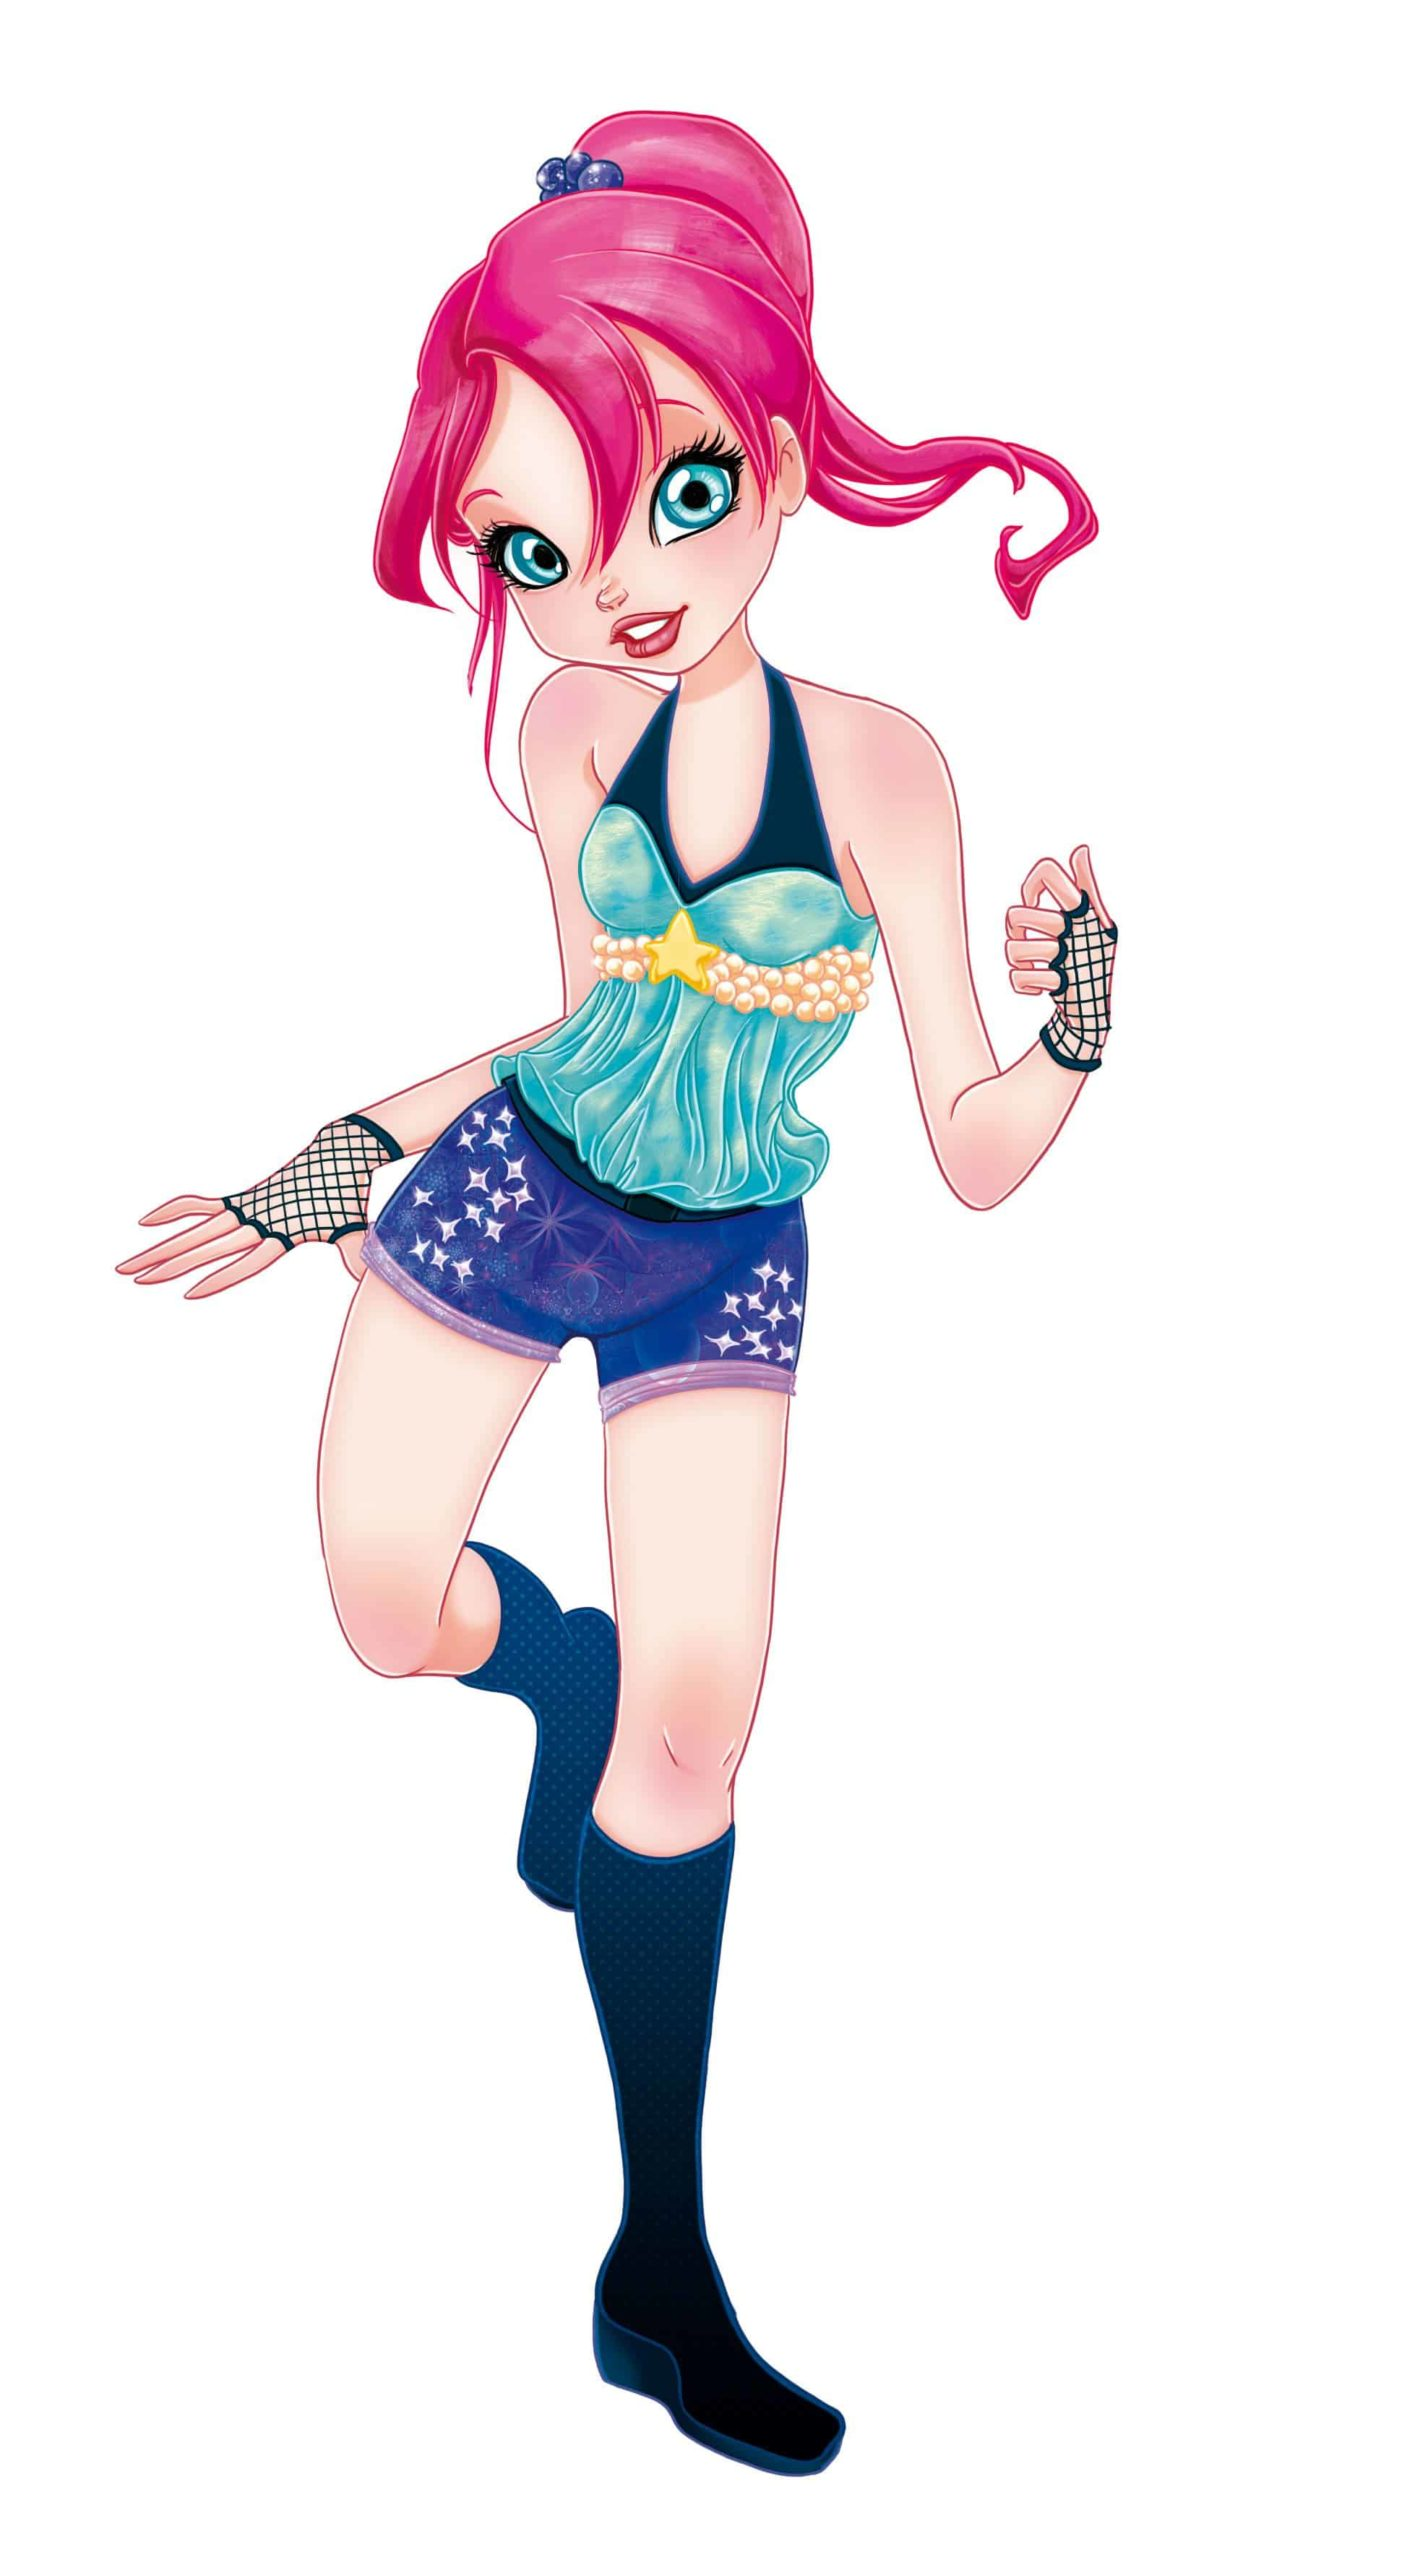 Disco Teen Illustration by Elisa Moriconi